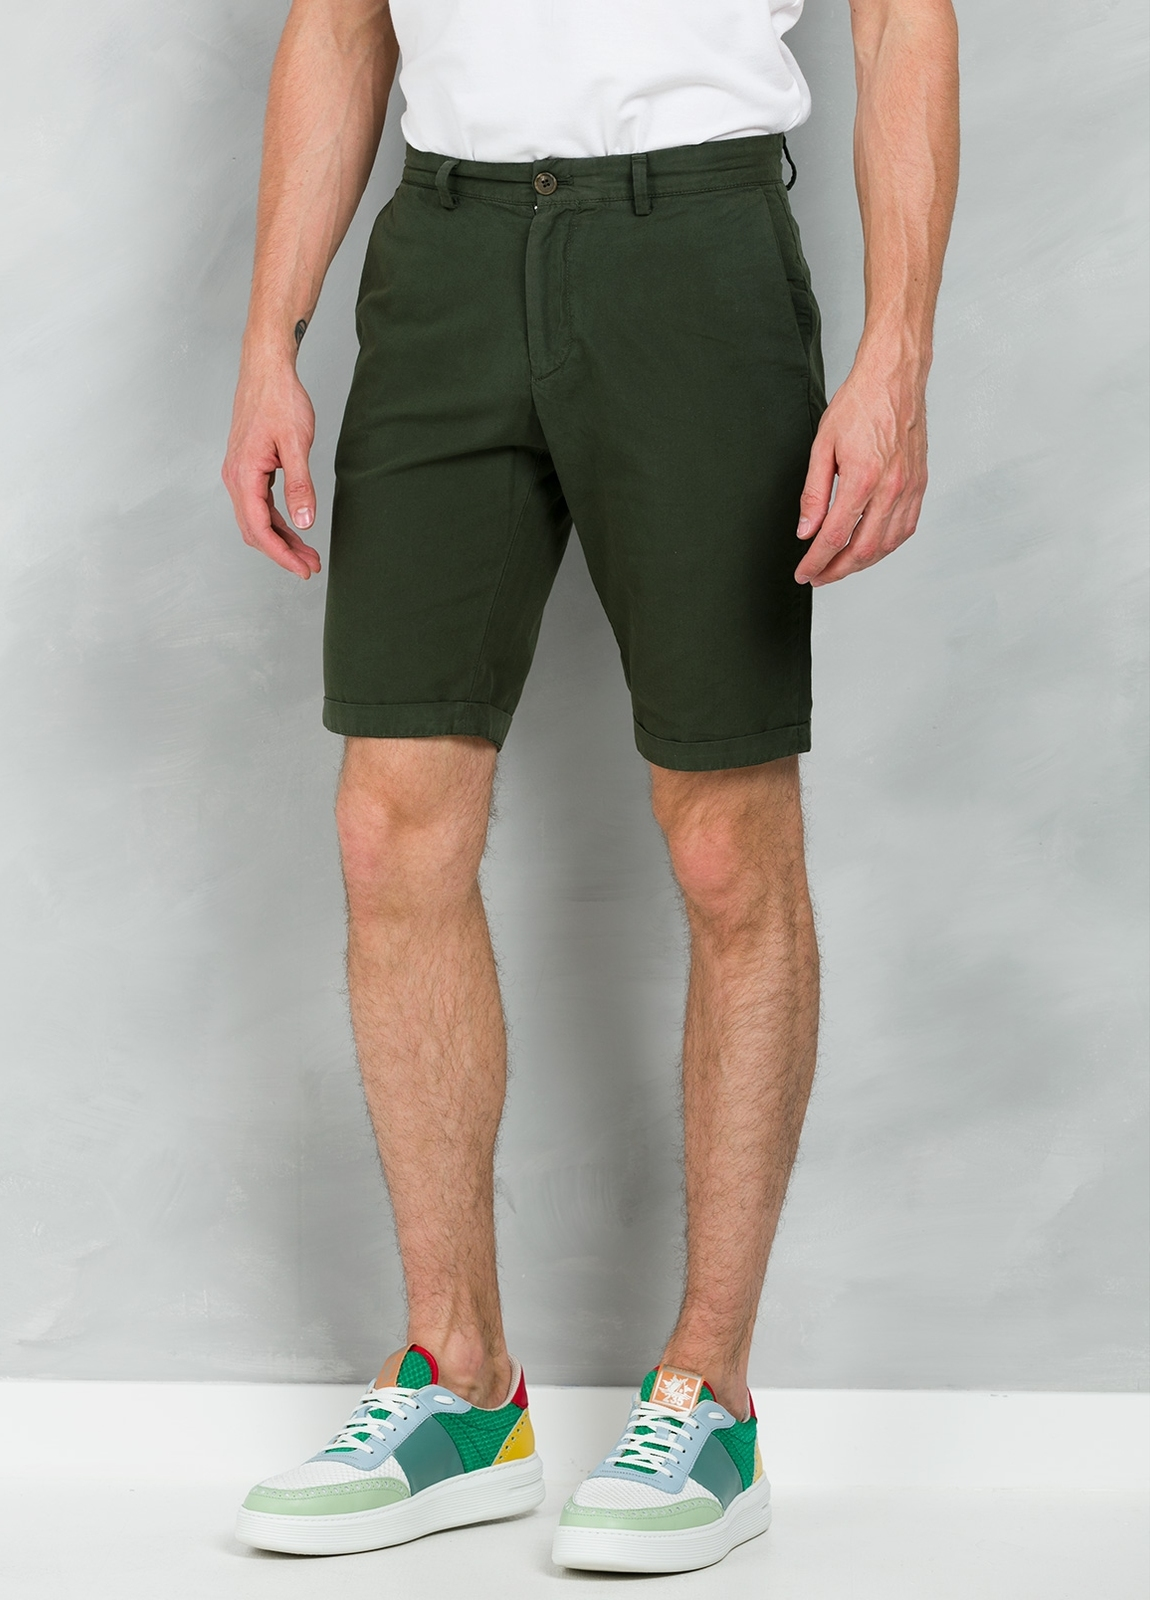 Short Furest Casual Wear color kaki, 100% Algodón.